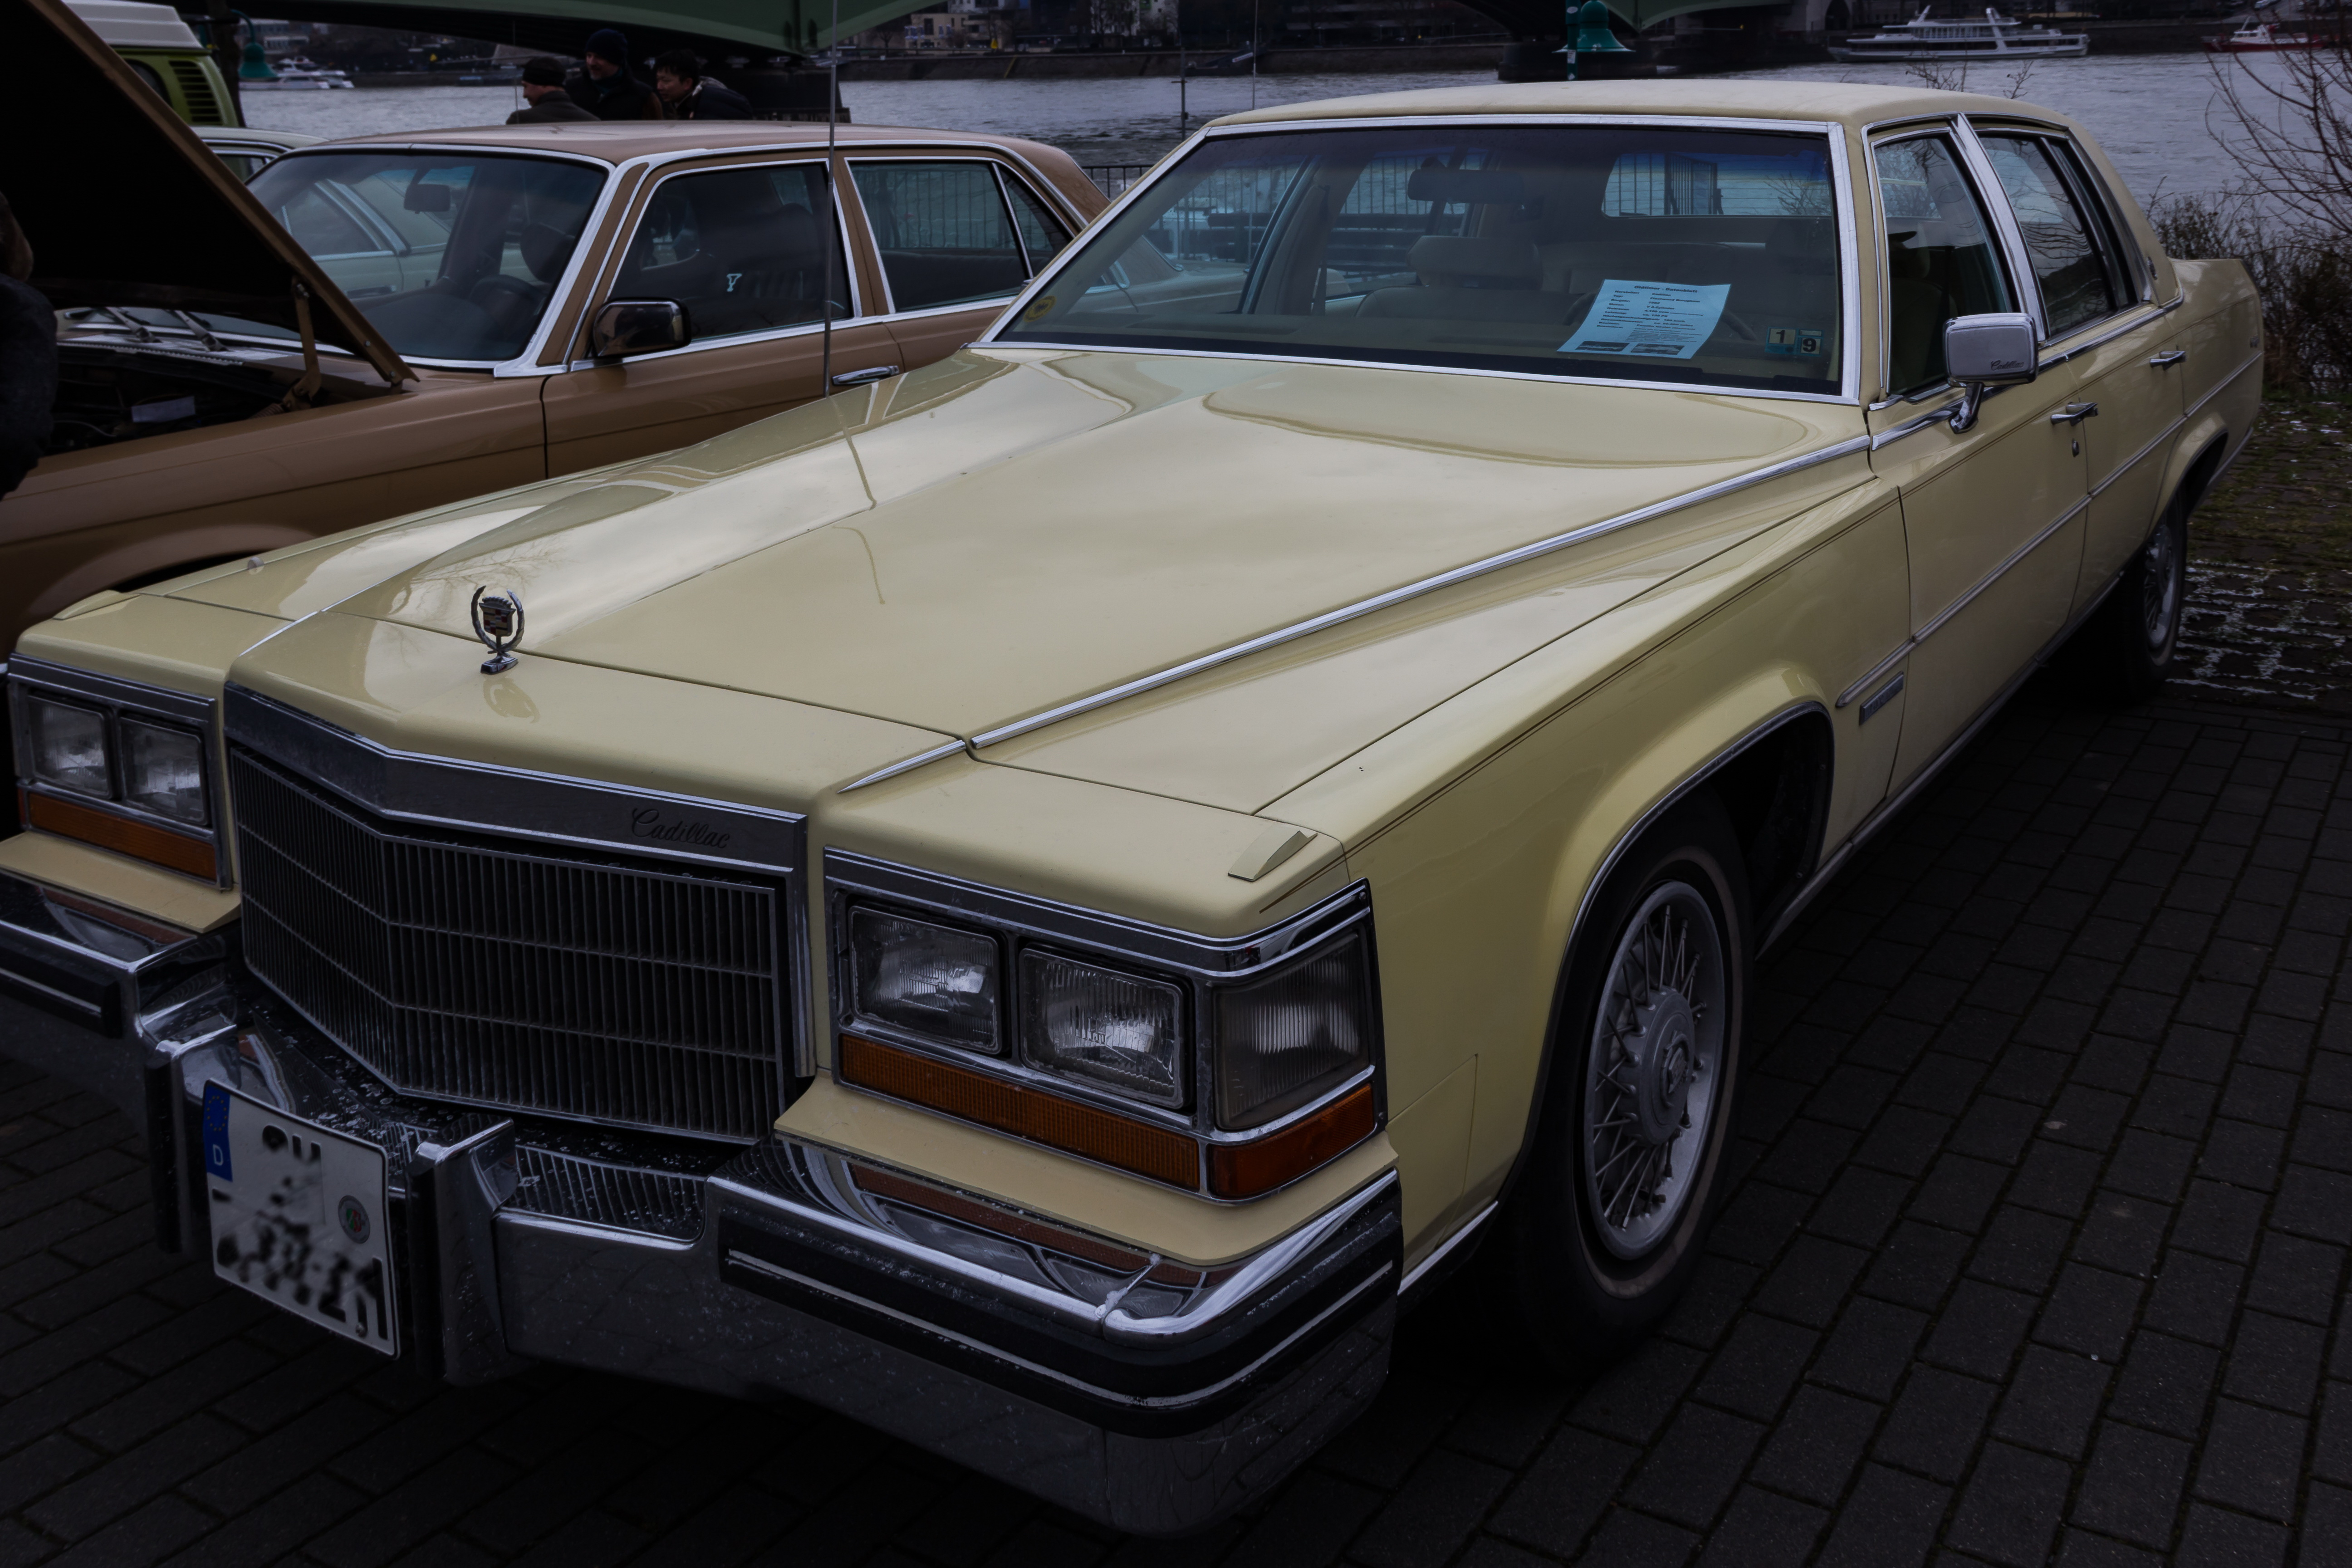 File 2018 03 18 Cadillac Fleetwood Brougham 01 Jpg Wikimedia Commons